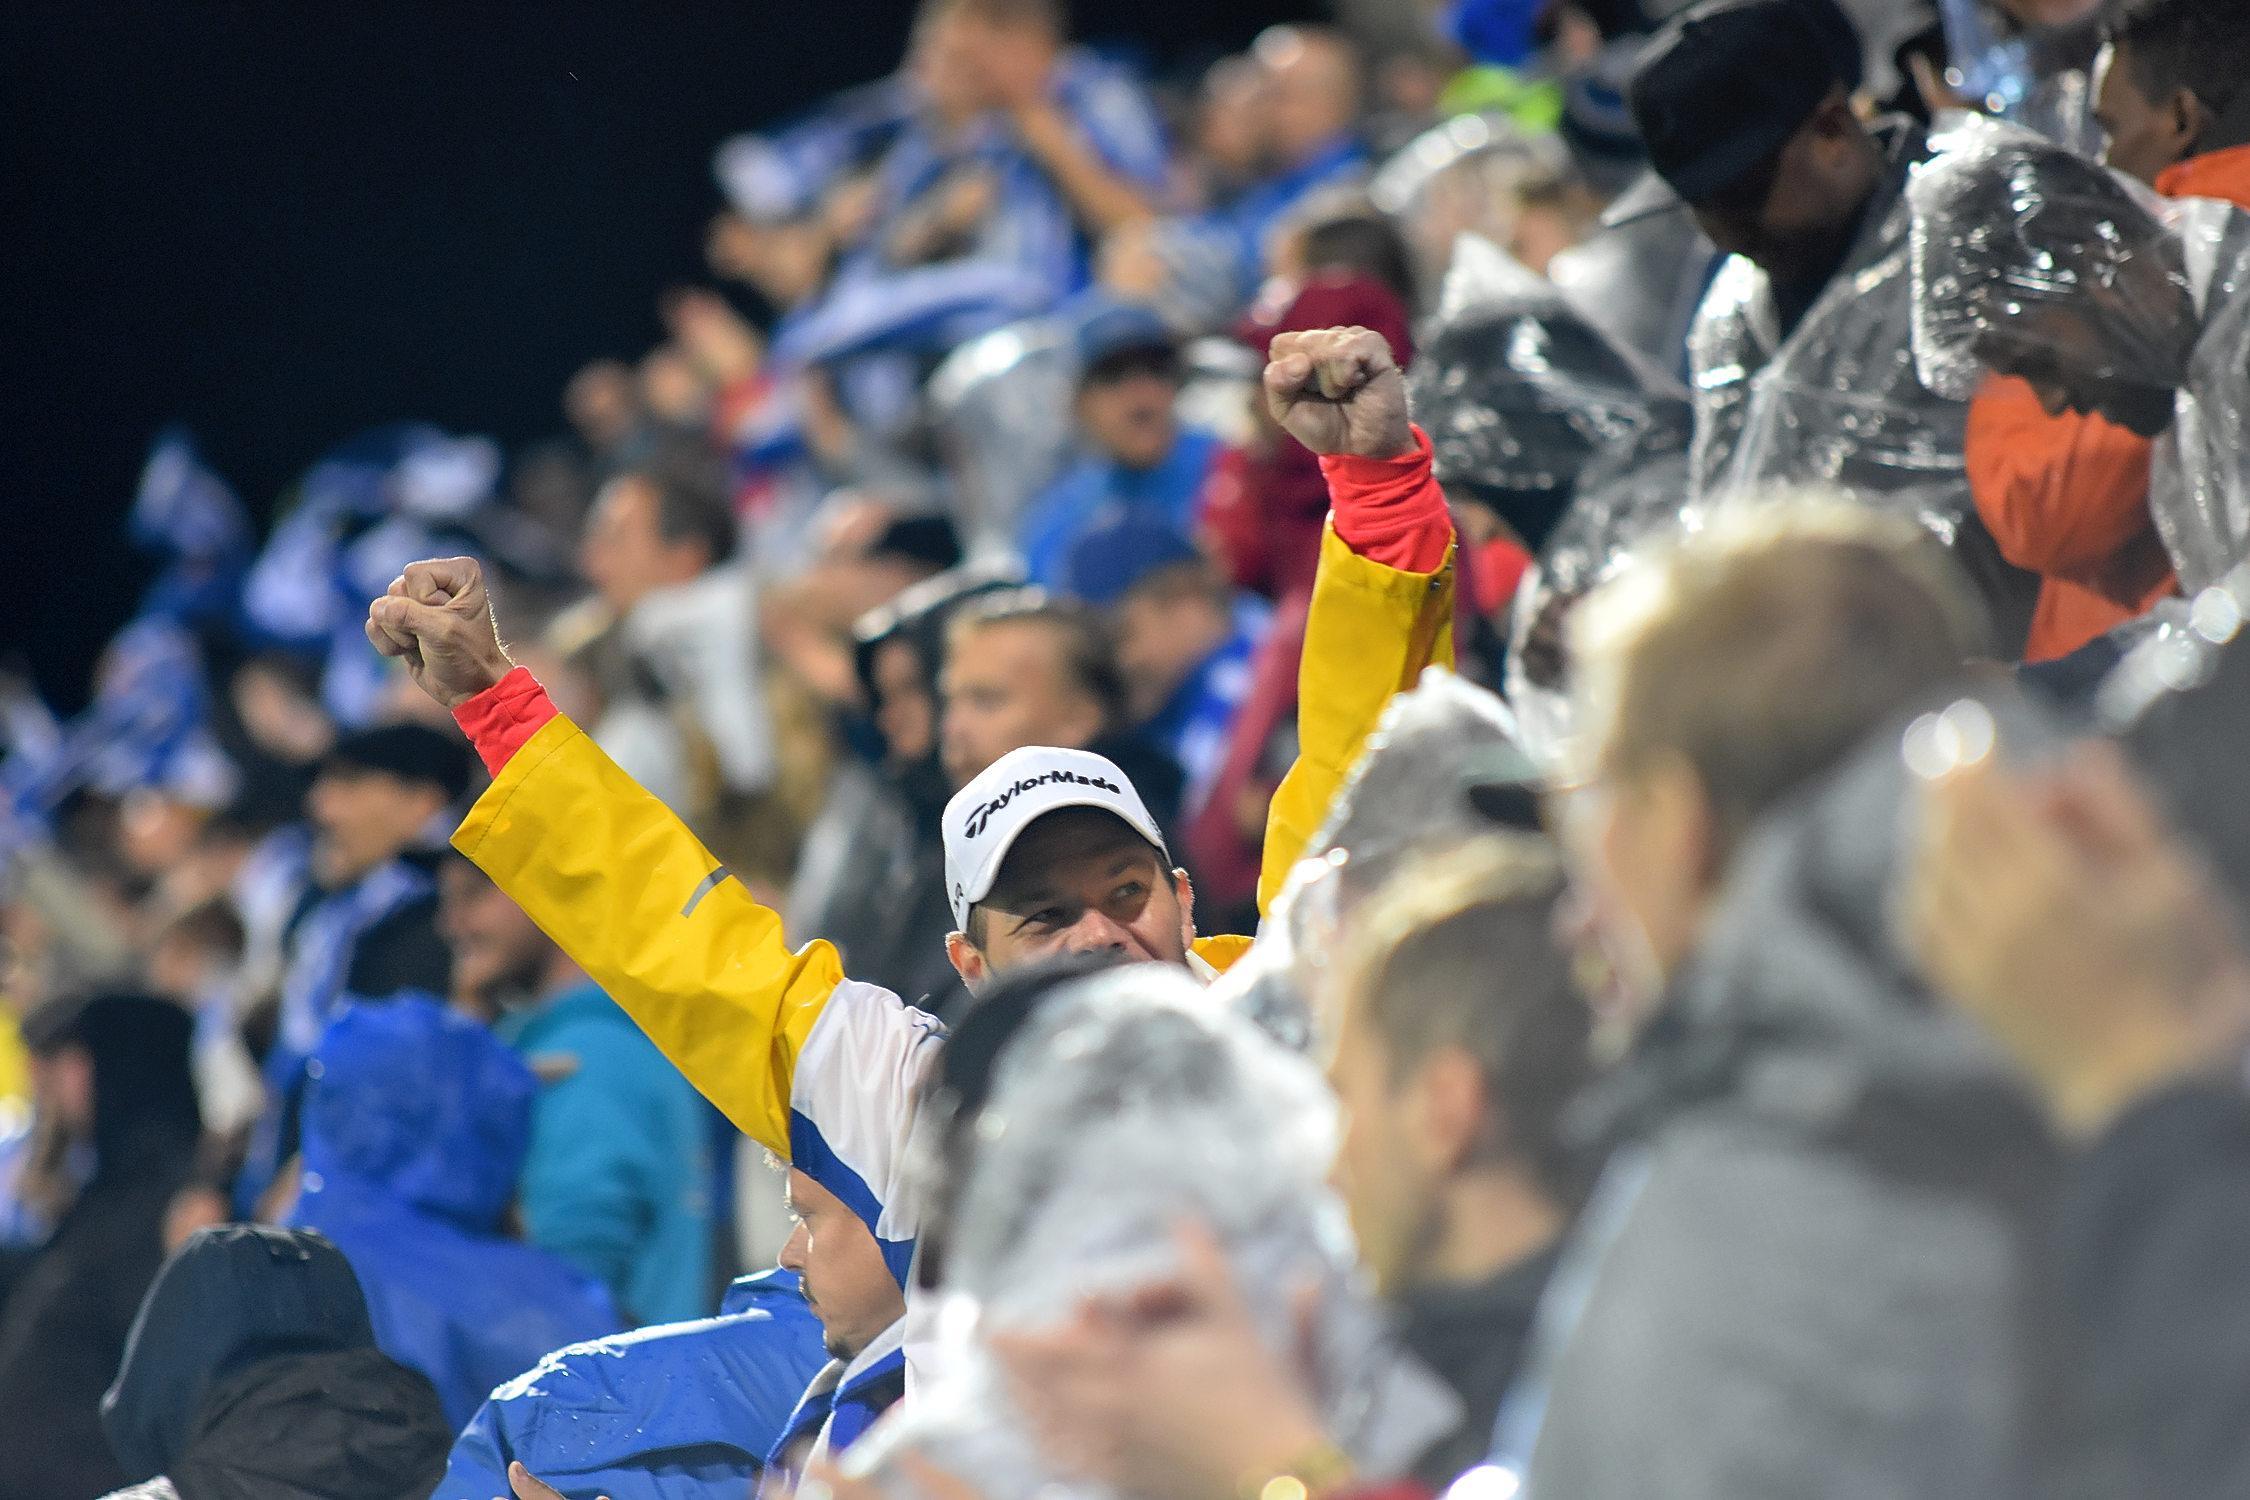 Publik heijjar på Finlands fotbollslandslag